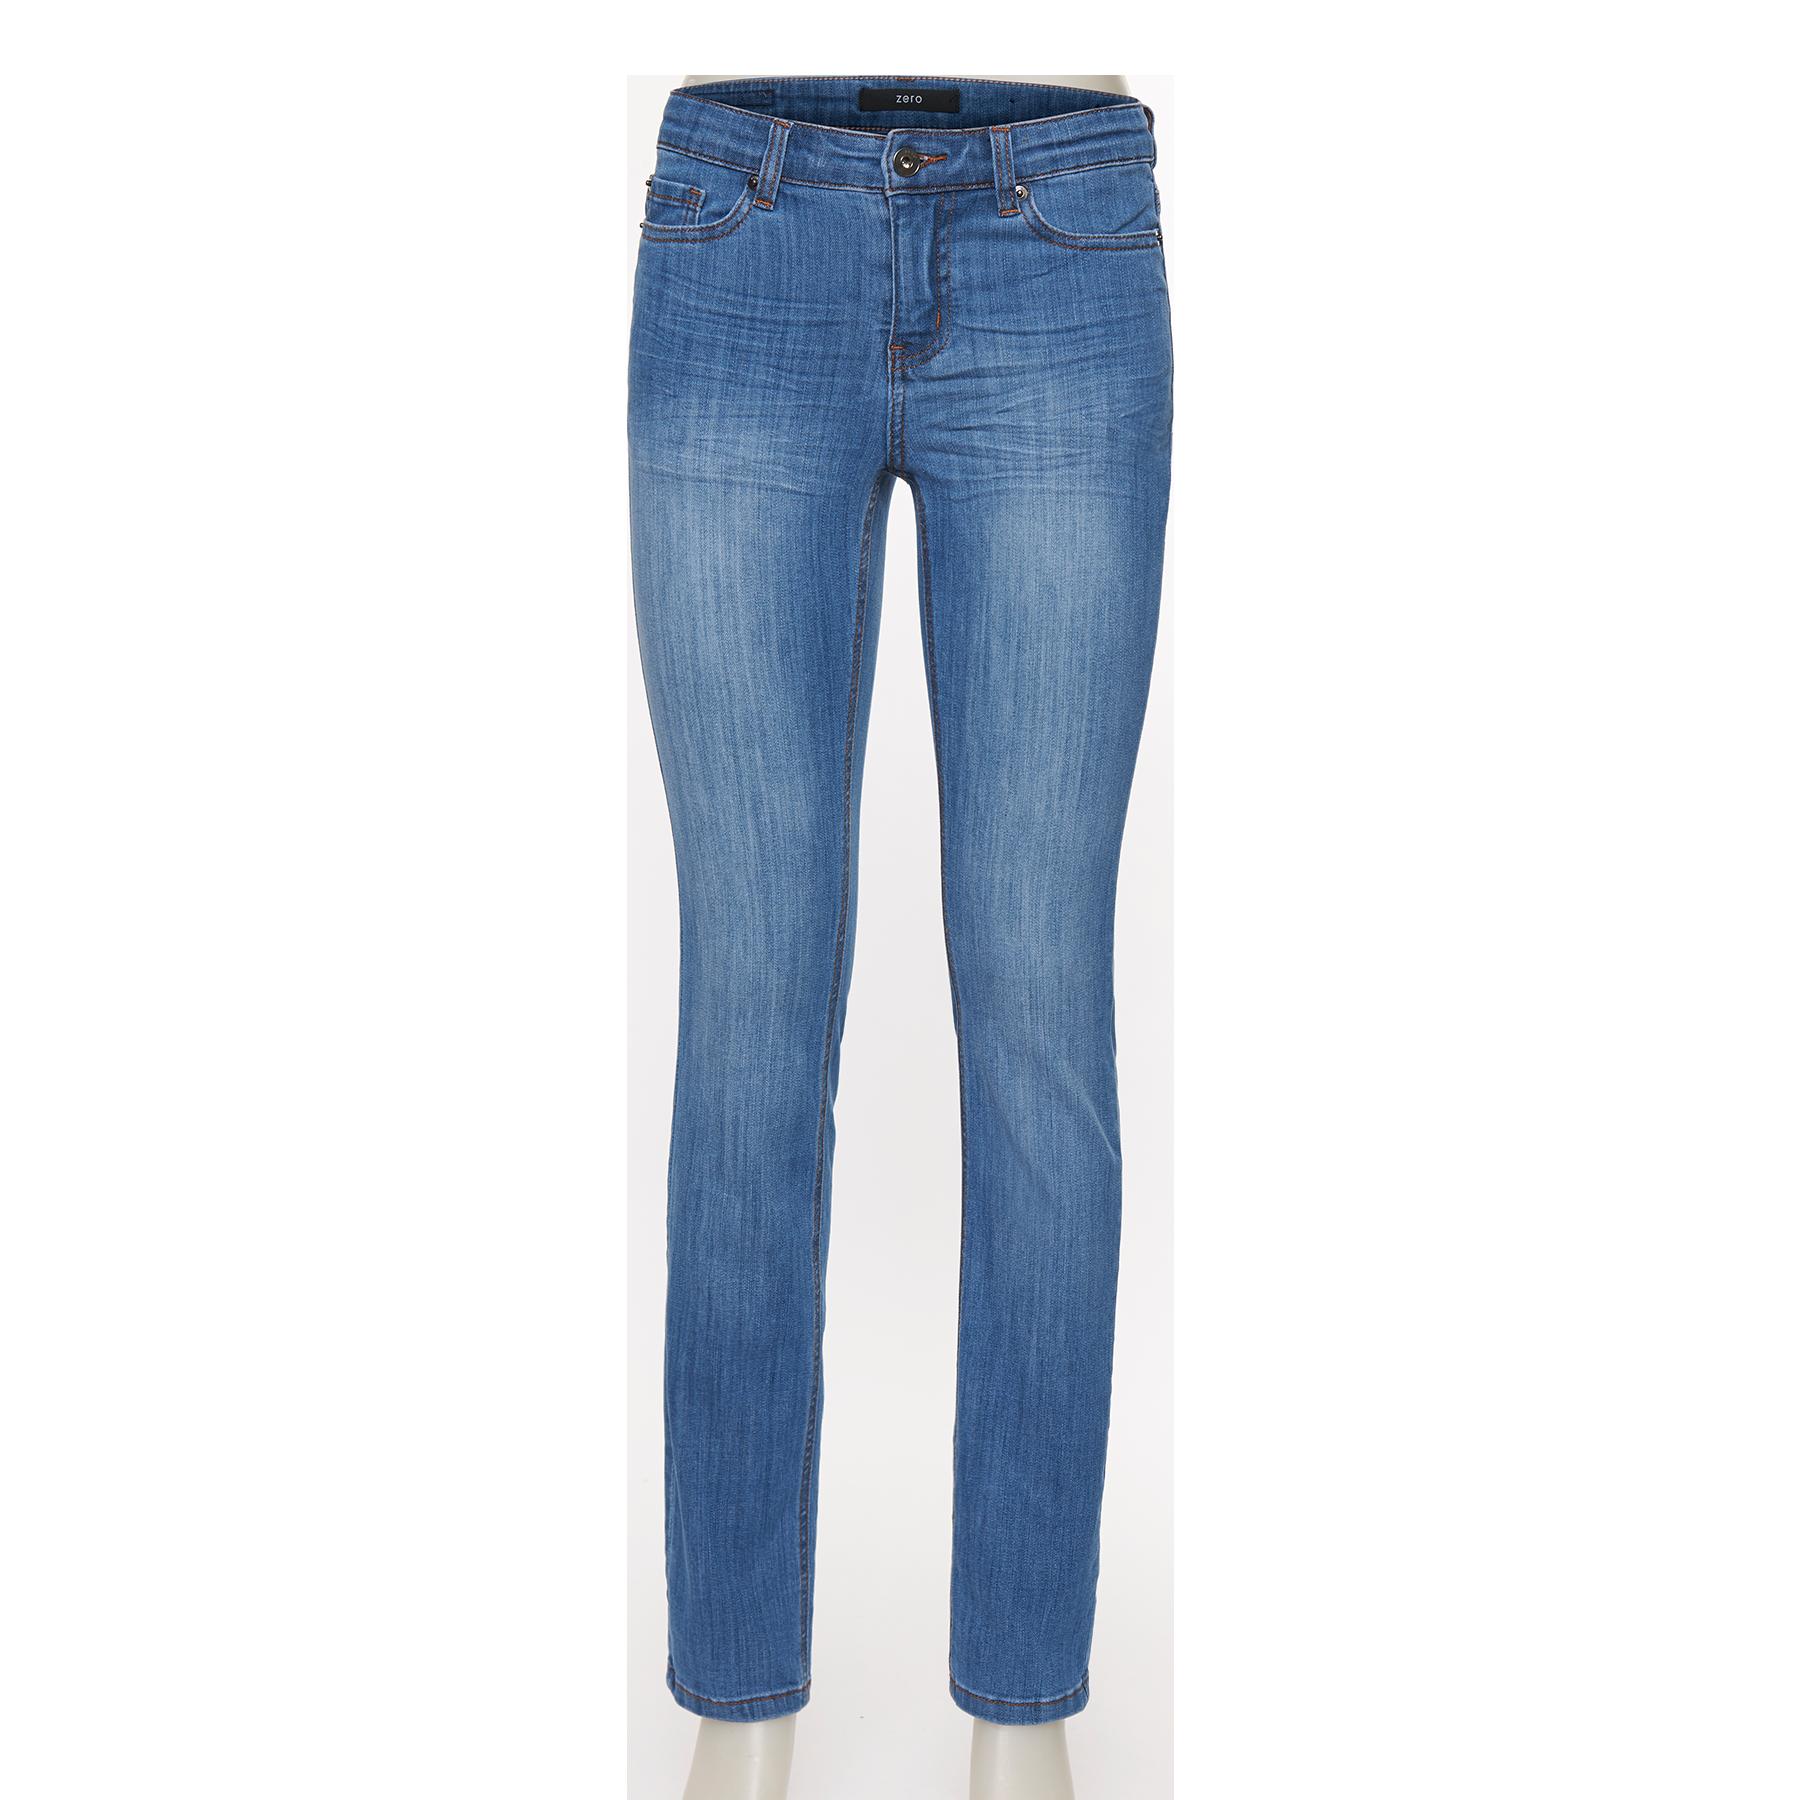 Slim Fit-Jeans Orlando, 32 inch denim mid blue washed